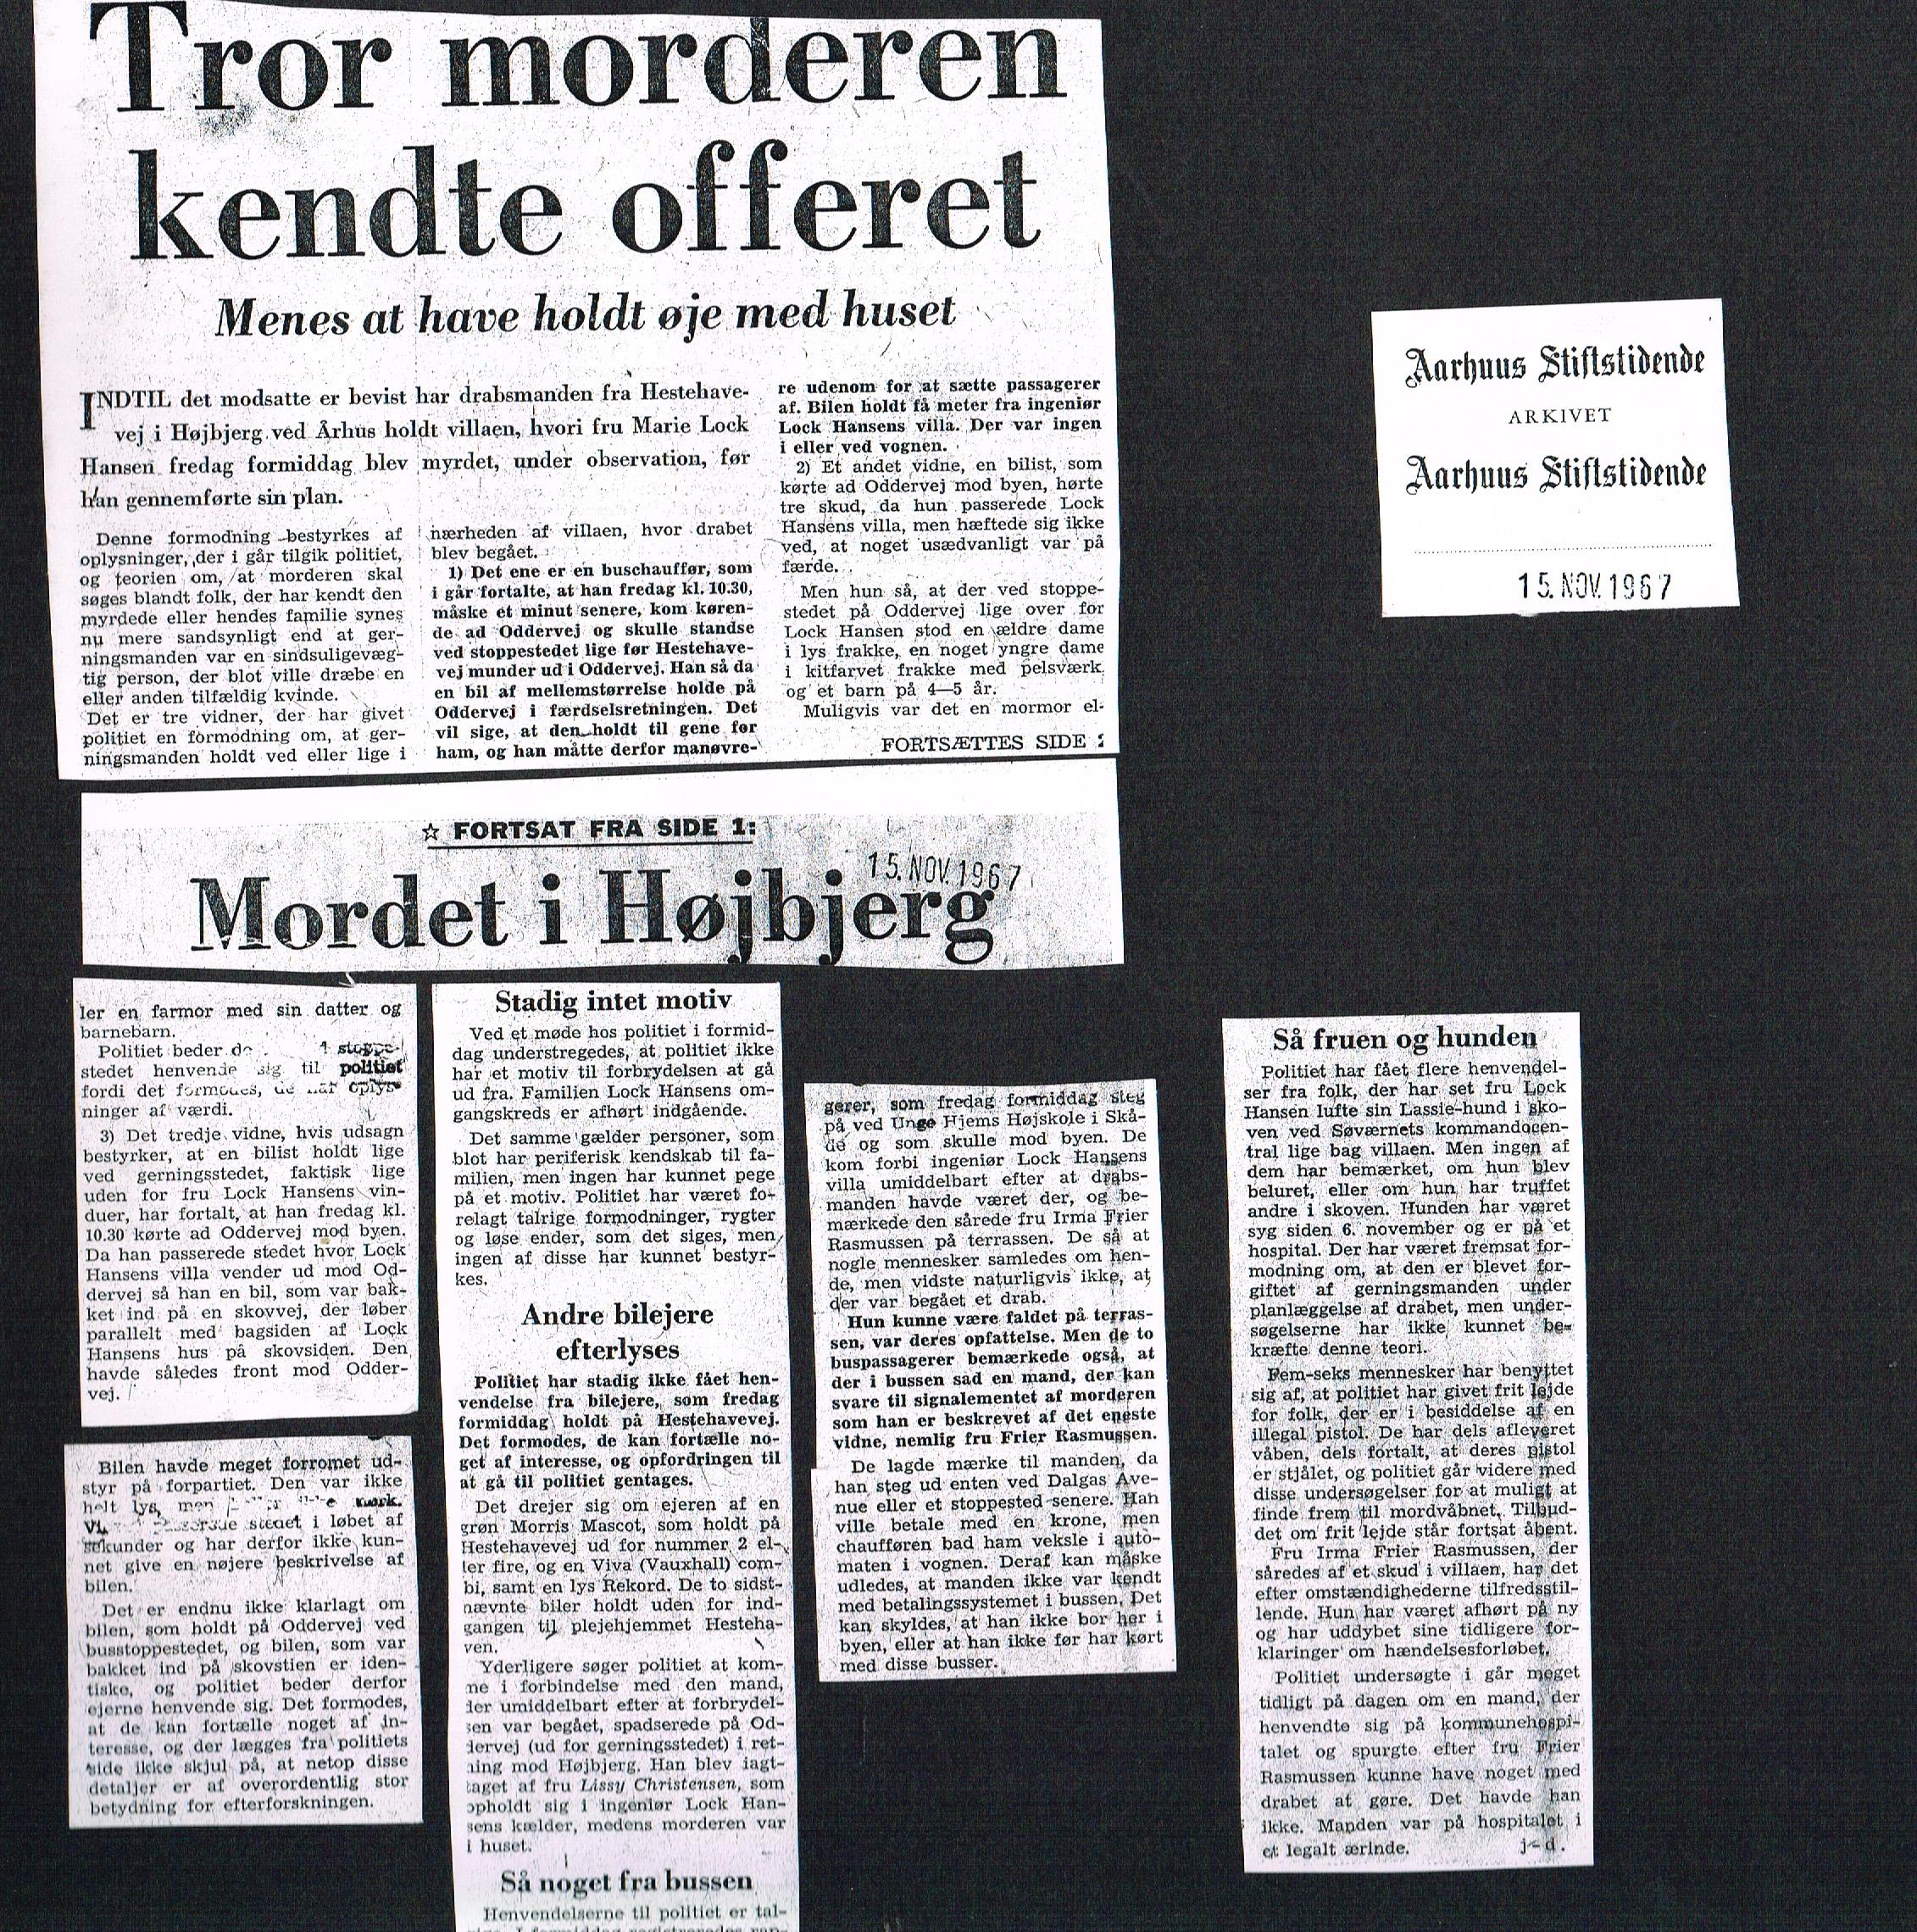 Højbjerg-drabet Aarhus Stiftstidende 15 november 1967